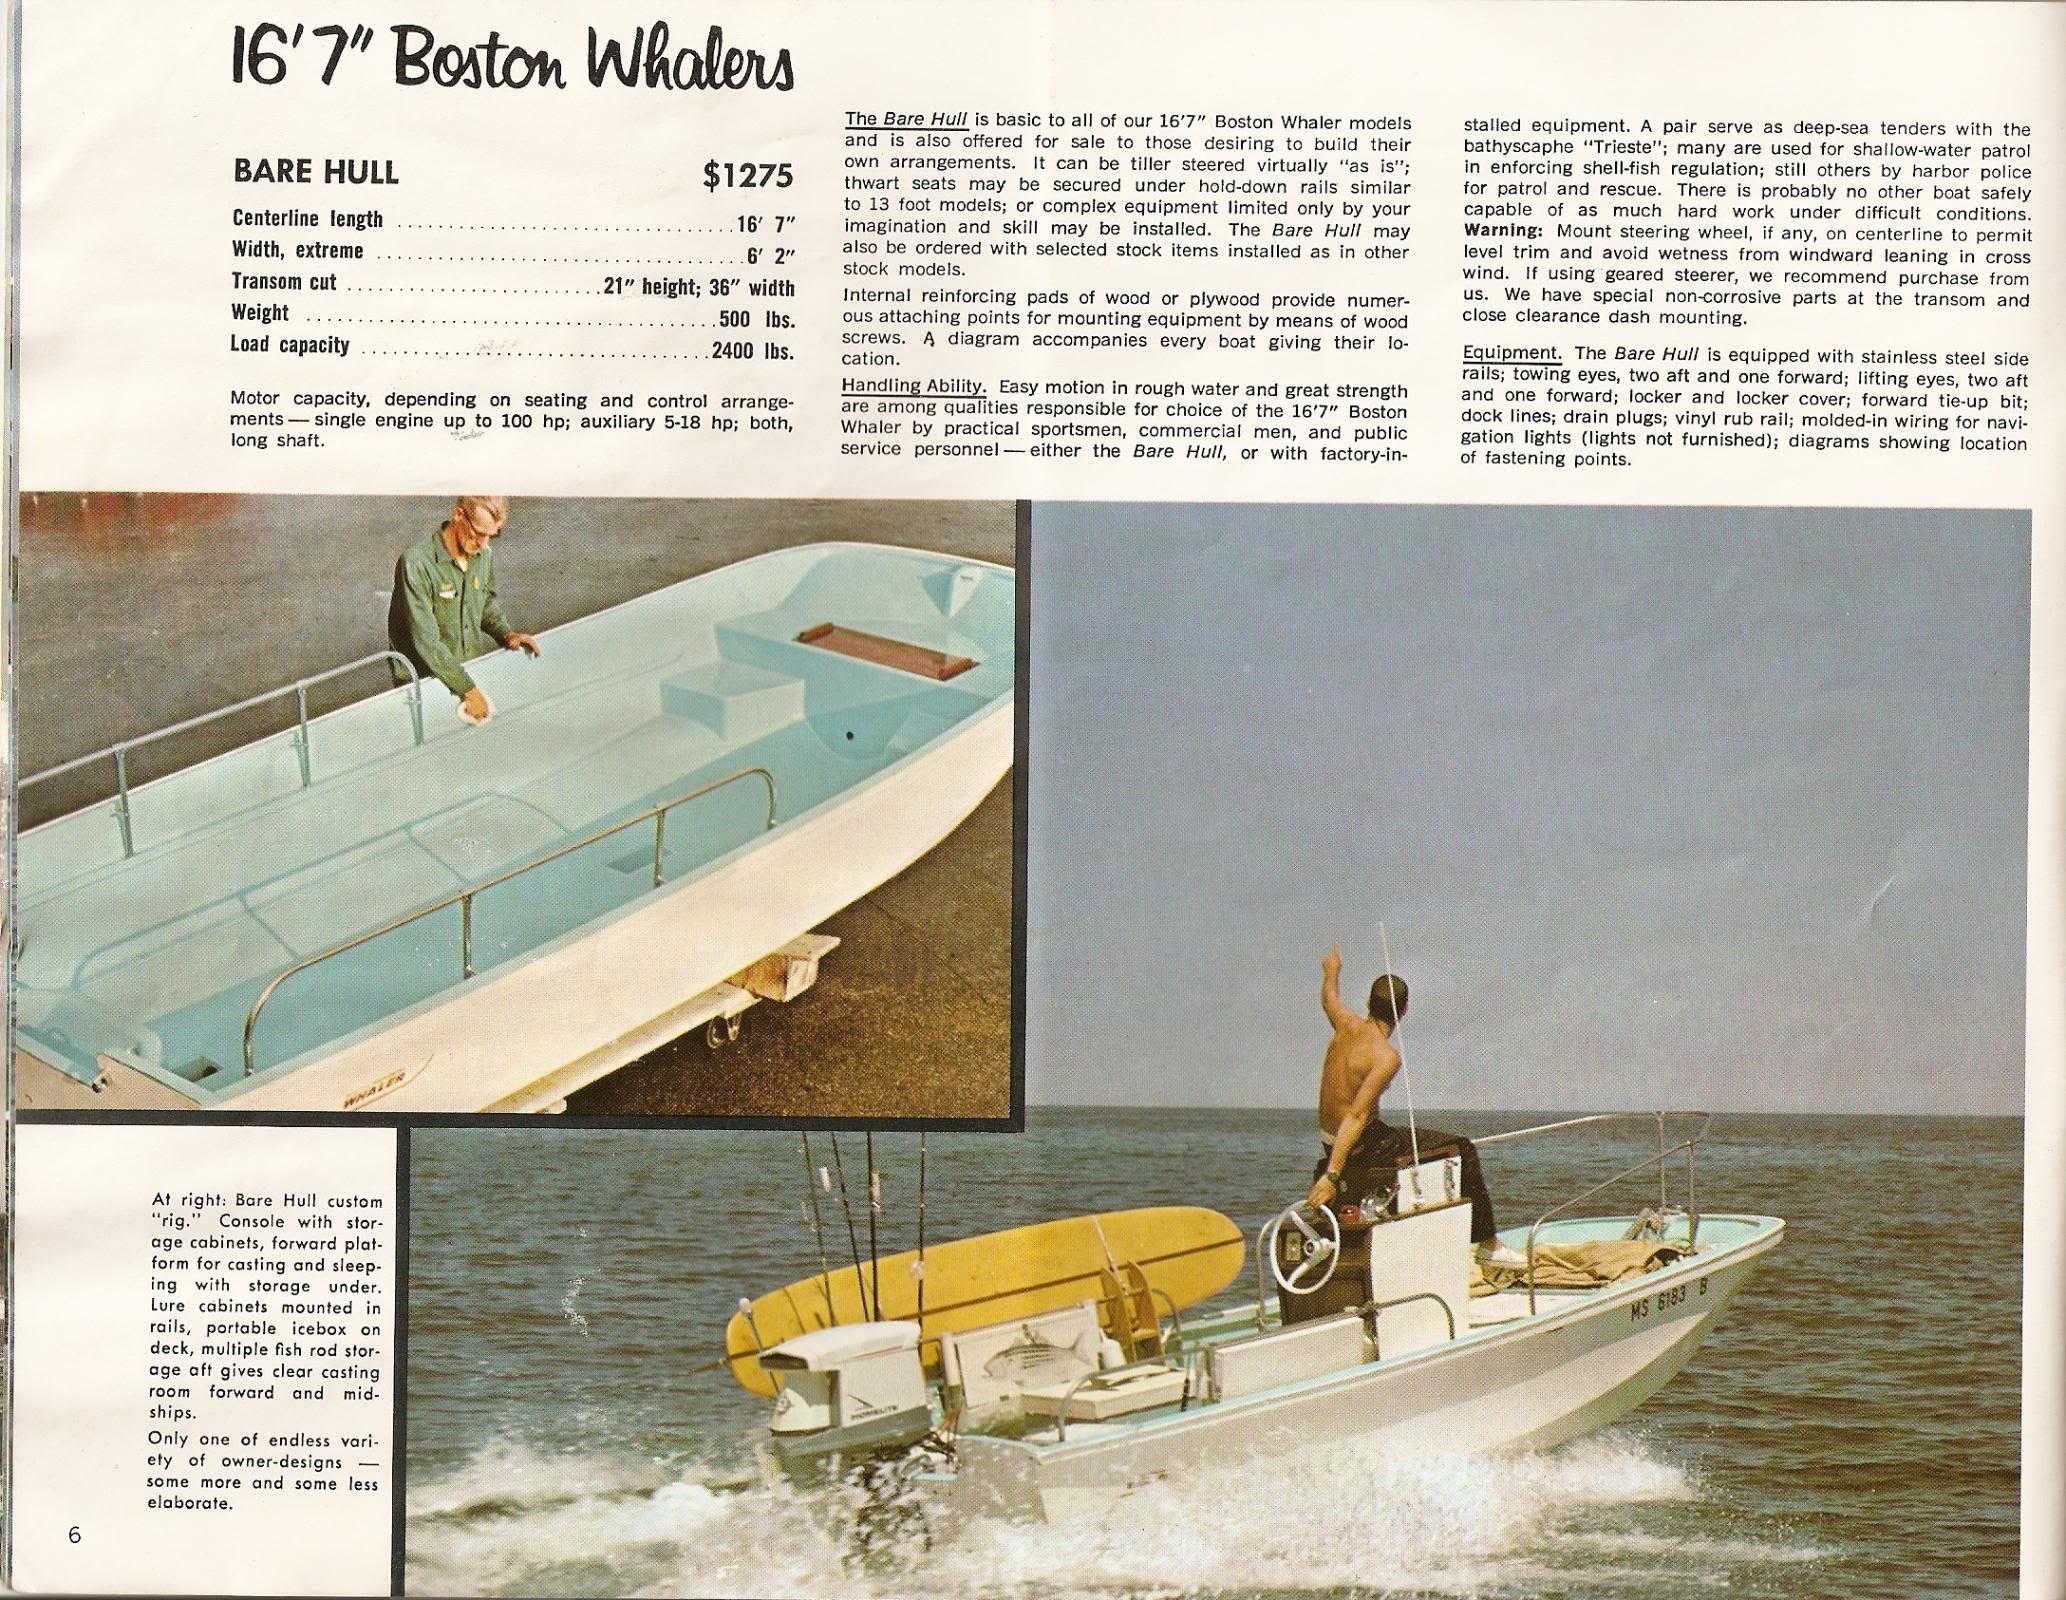 photo pg6.jpg boats Pinterest